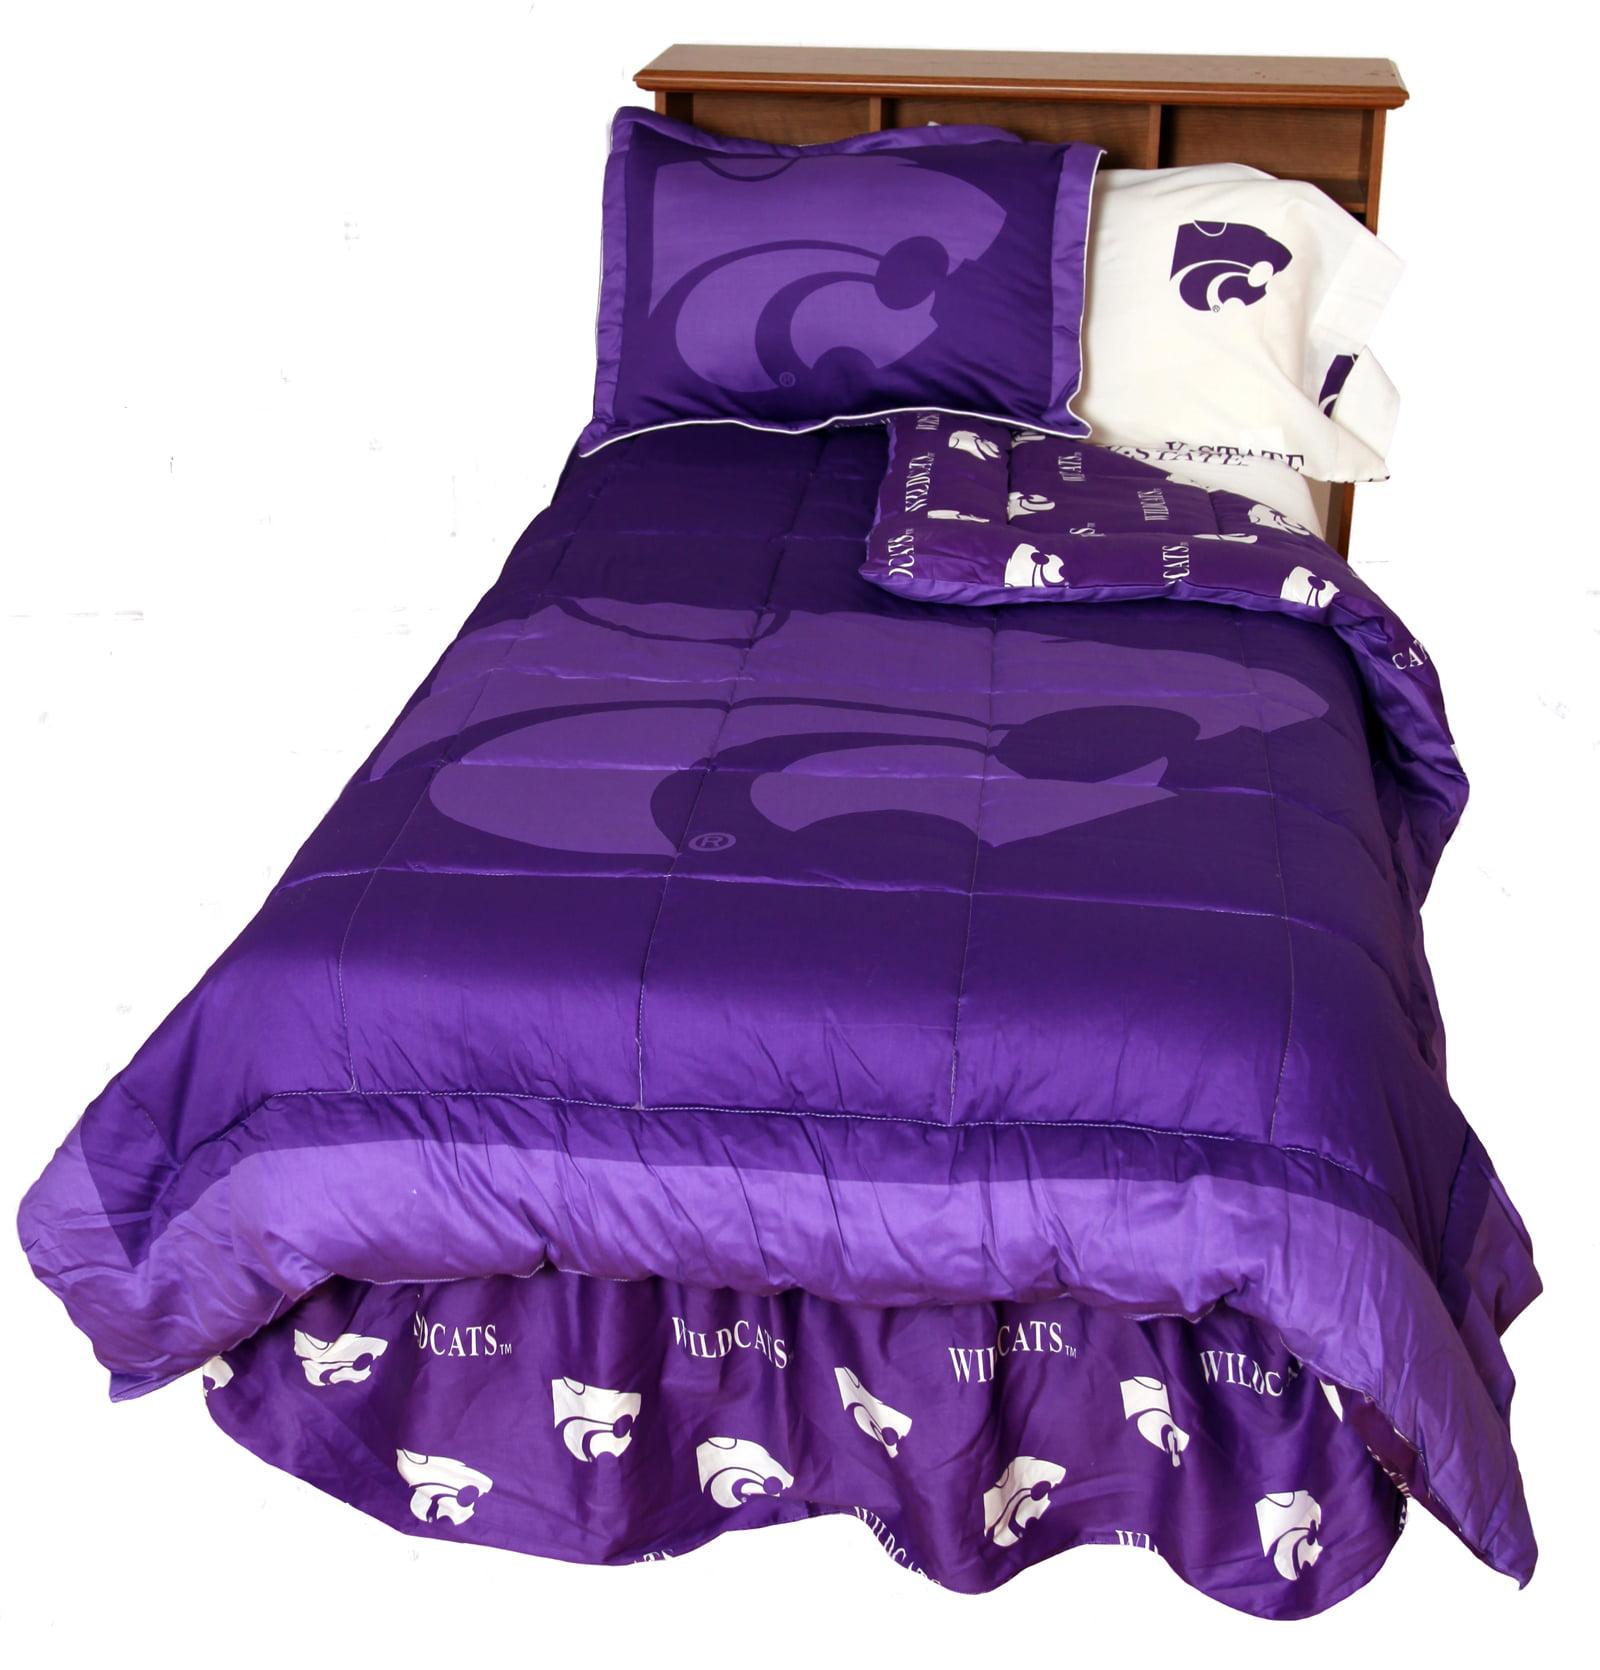 Kansas State Wildcats 2 Pc Comforter Set, 1 Comforter, 1 Sham, Twin